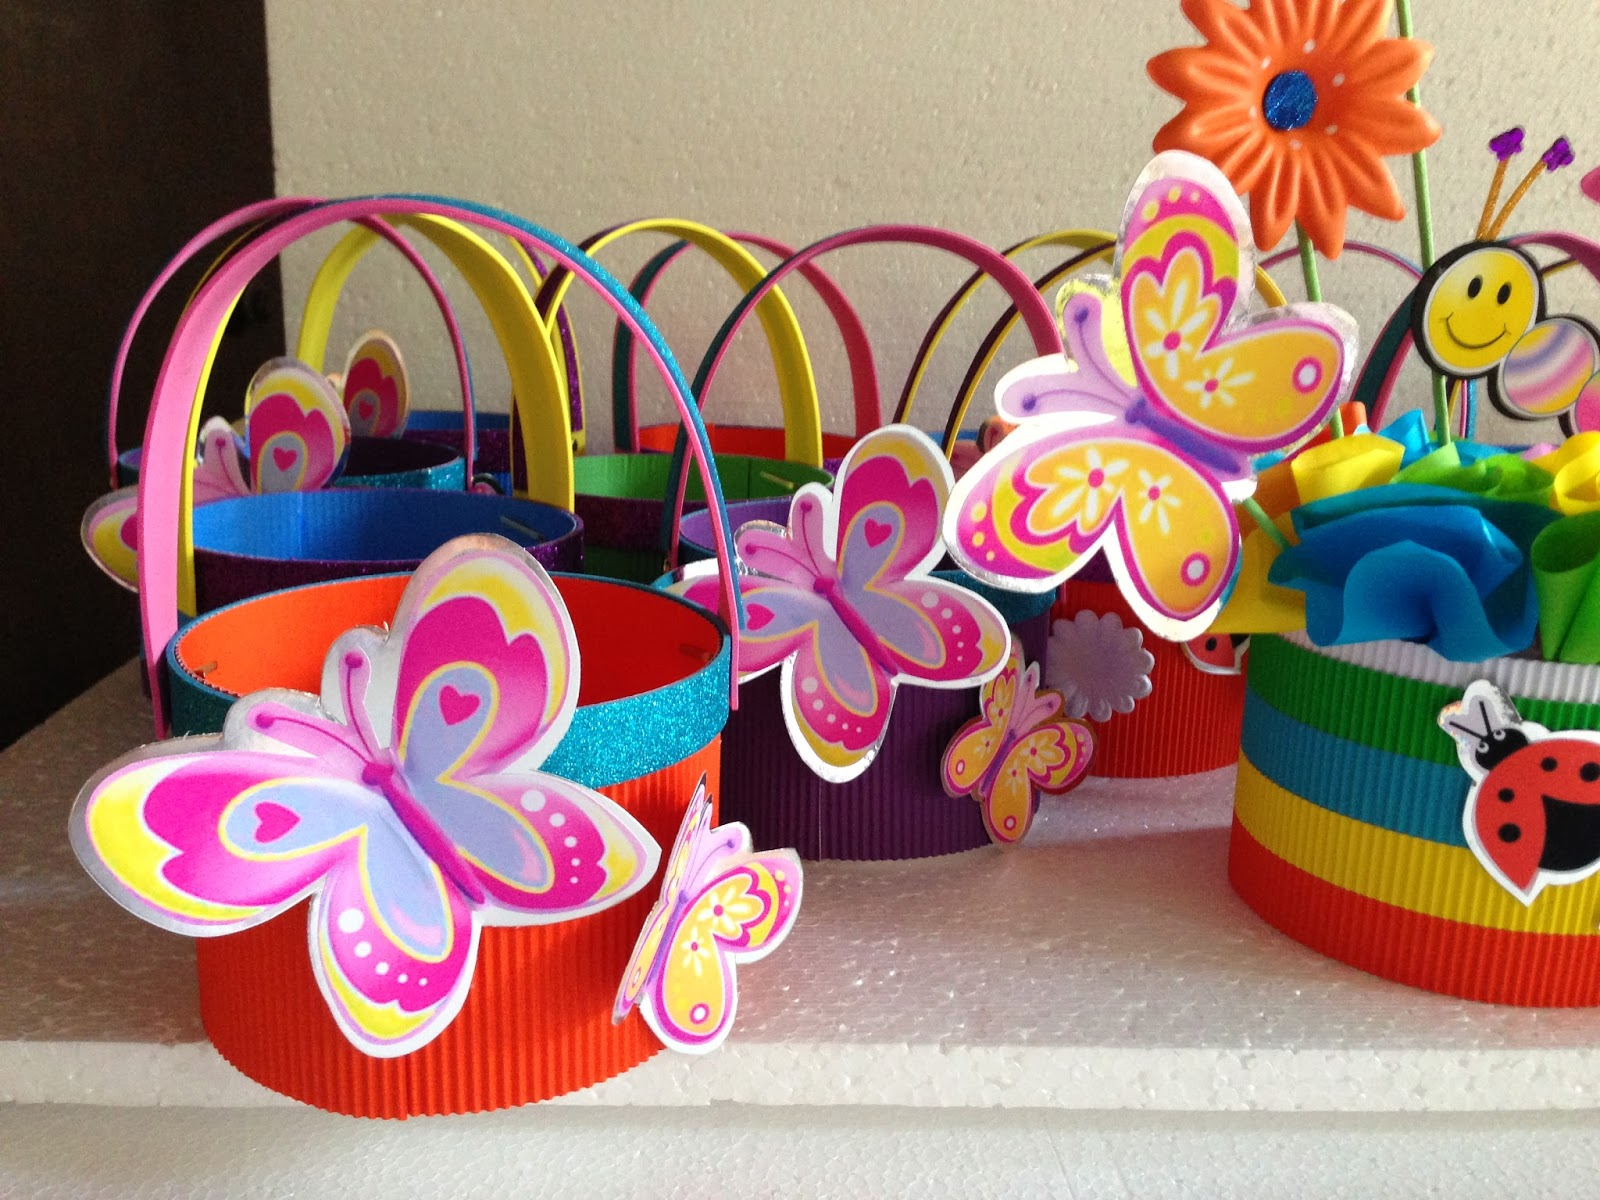 Decoraci n para un cumplea os de mariposas - Mariposas decoracion pared ...